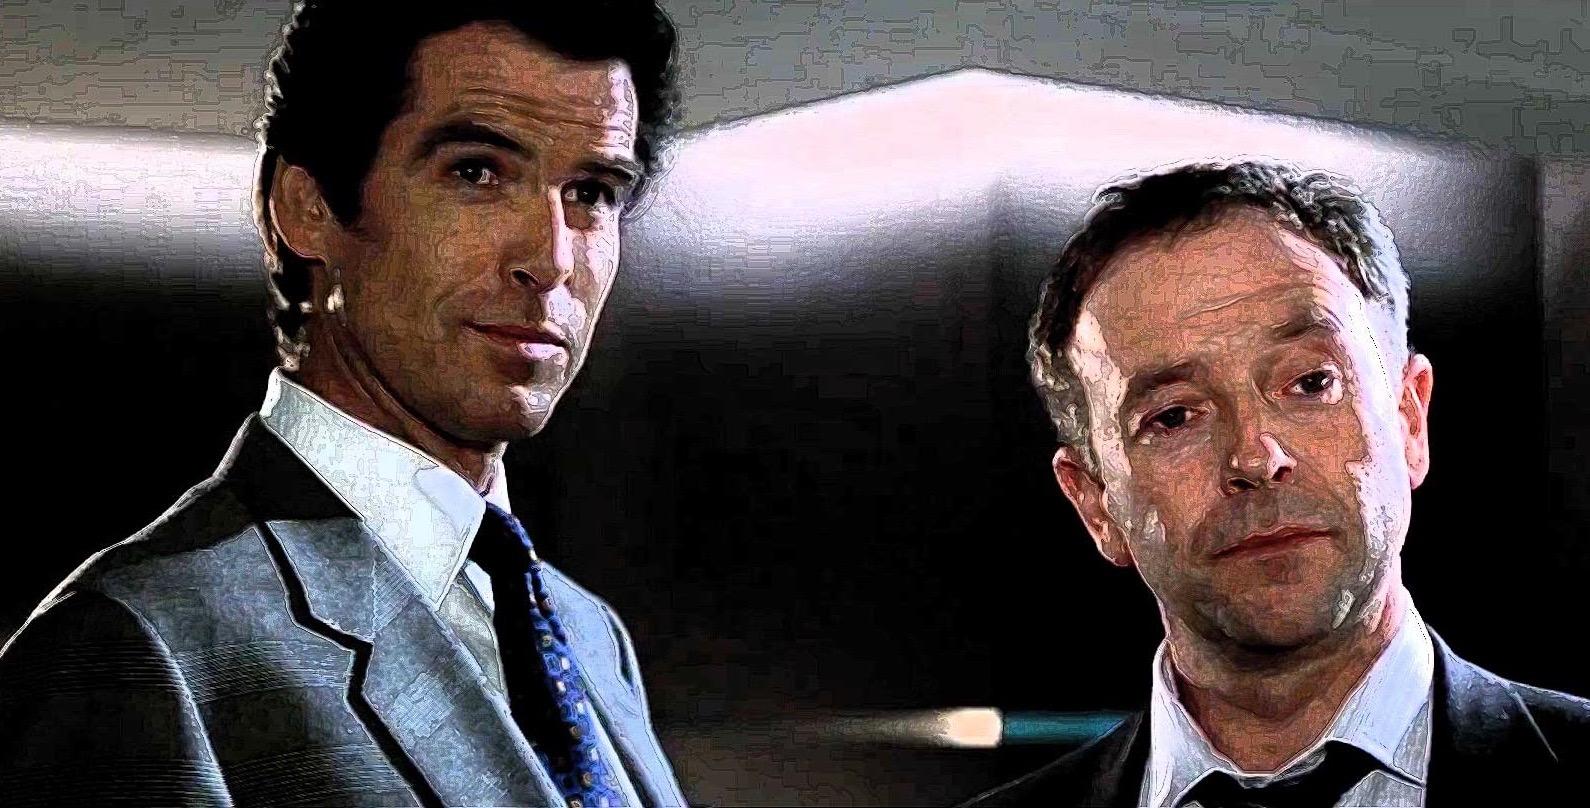 Bond and Tanner in Goldeneye